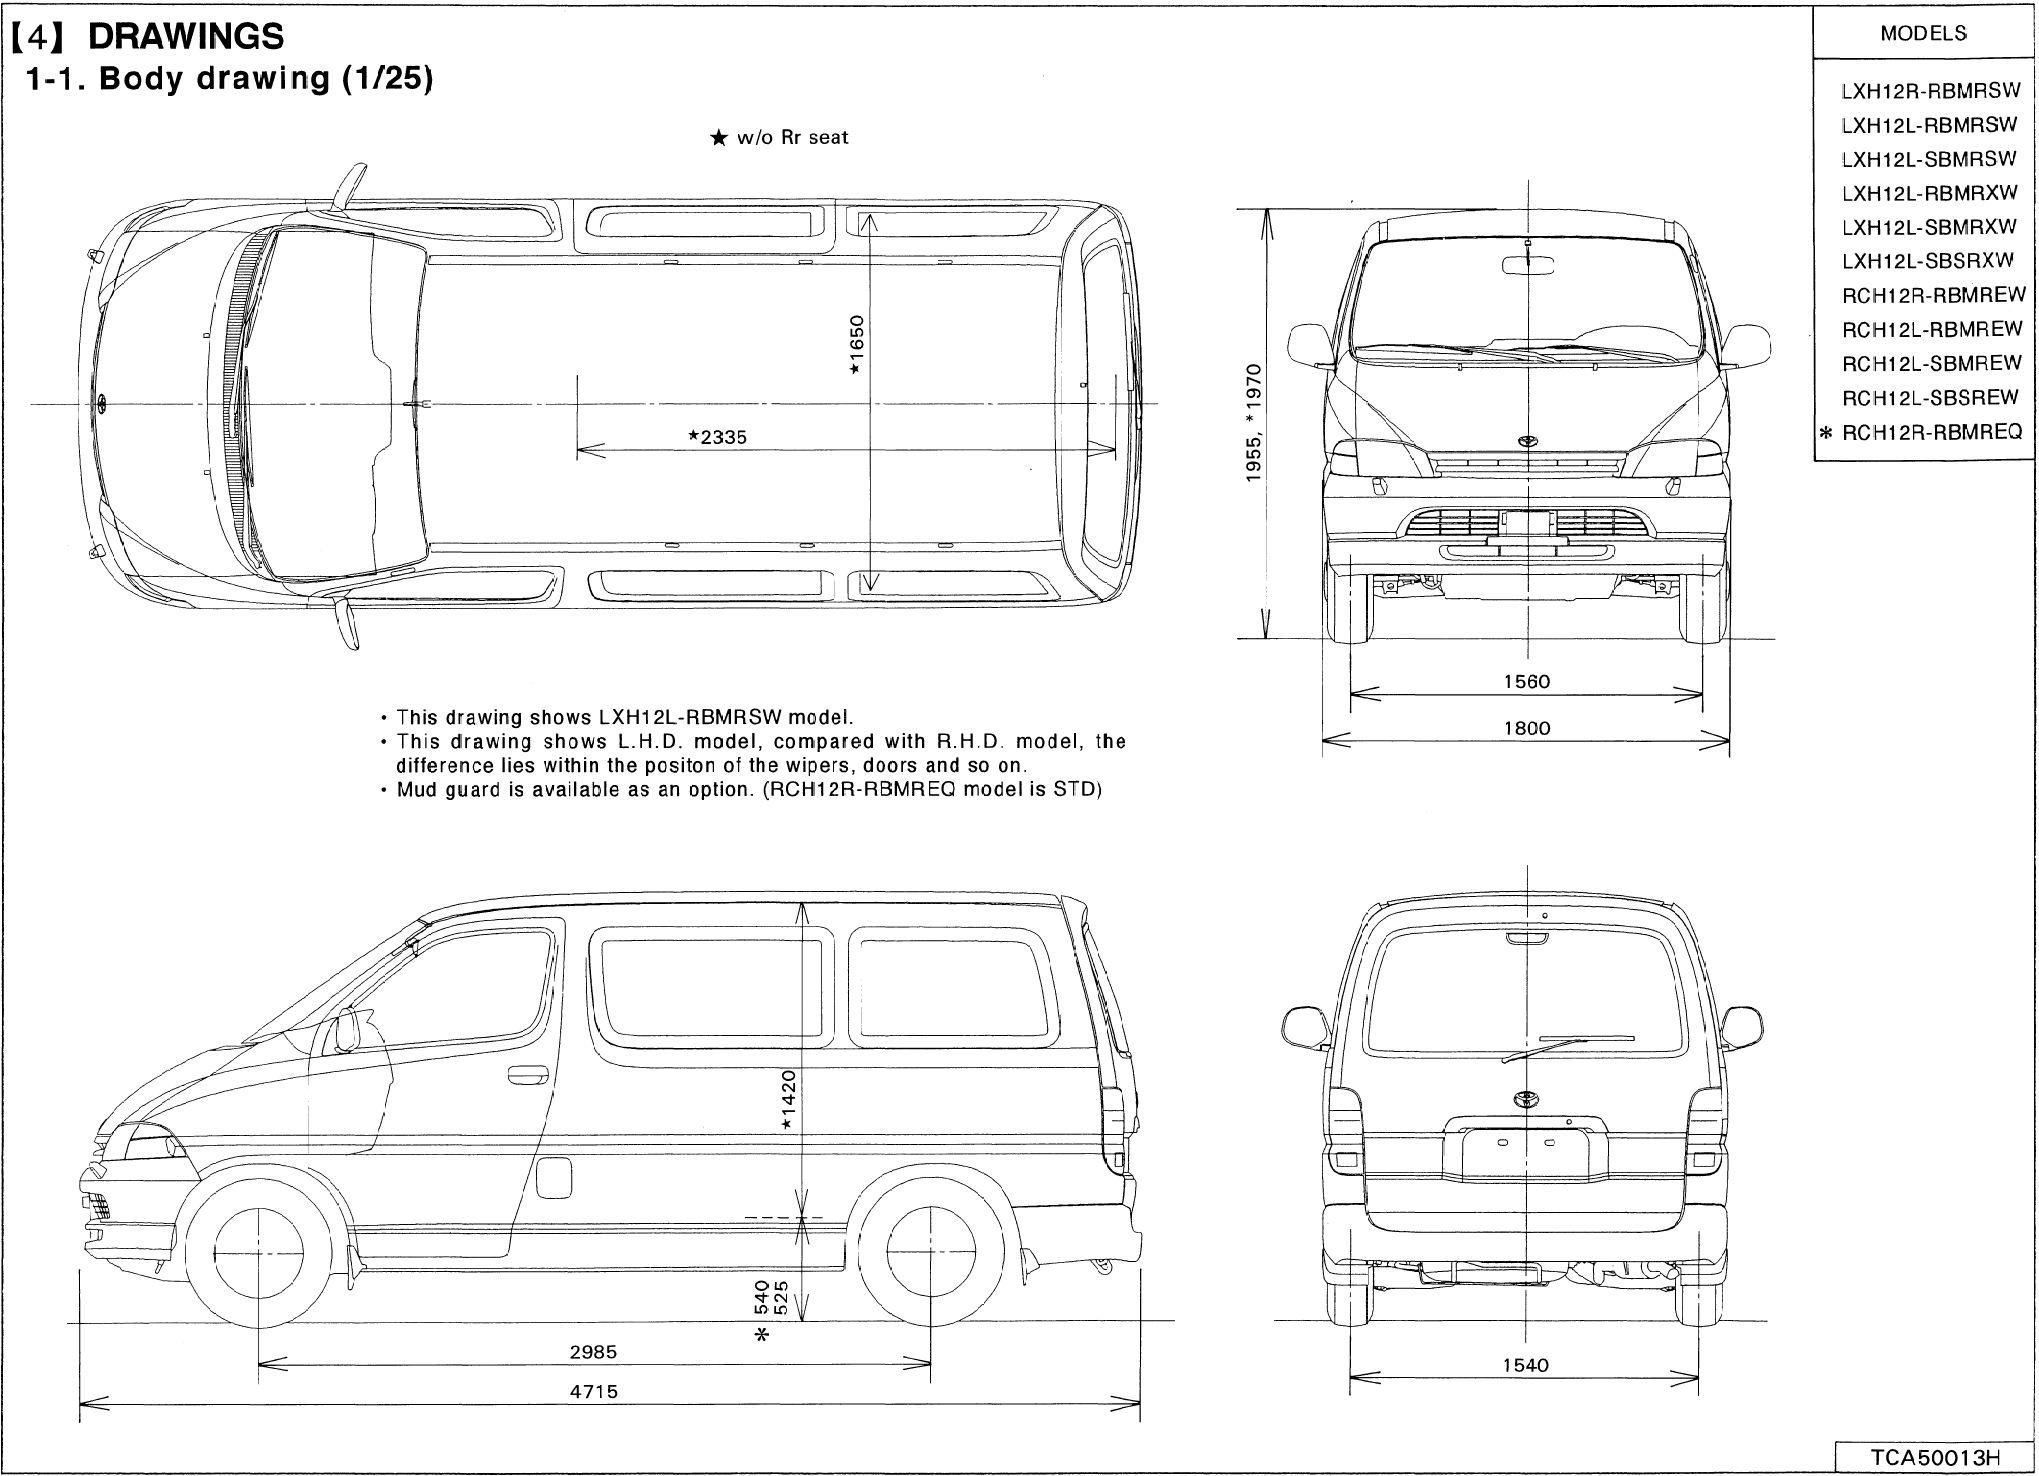 medium resolution of toyota hiace blueprint toyota hiace checklist toyota hiace toyota hiace wiring diagram 1998 toyota hiace diagram